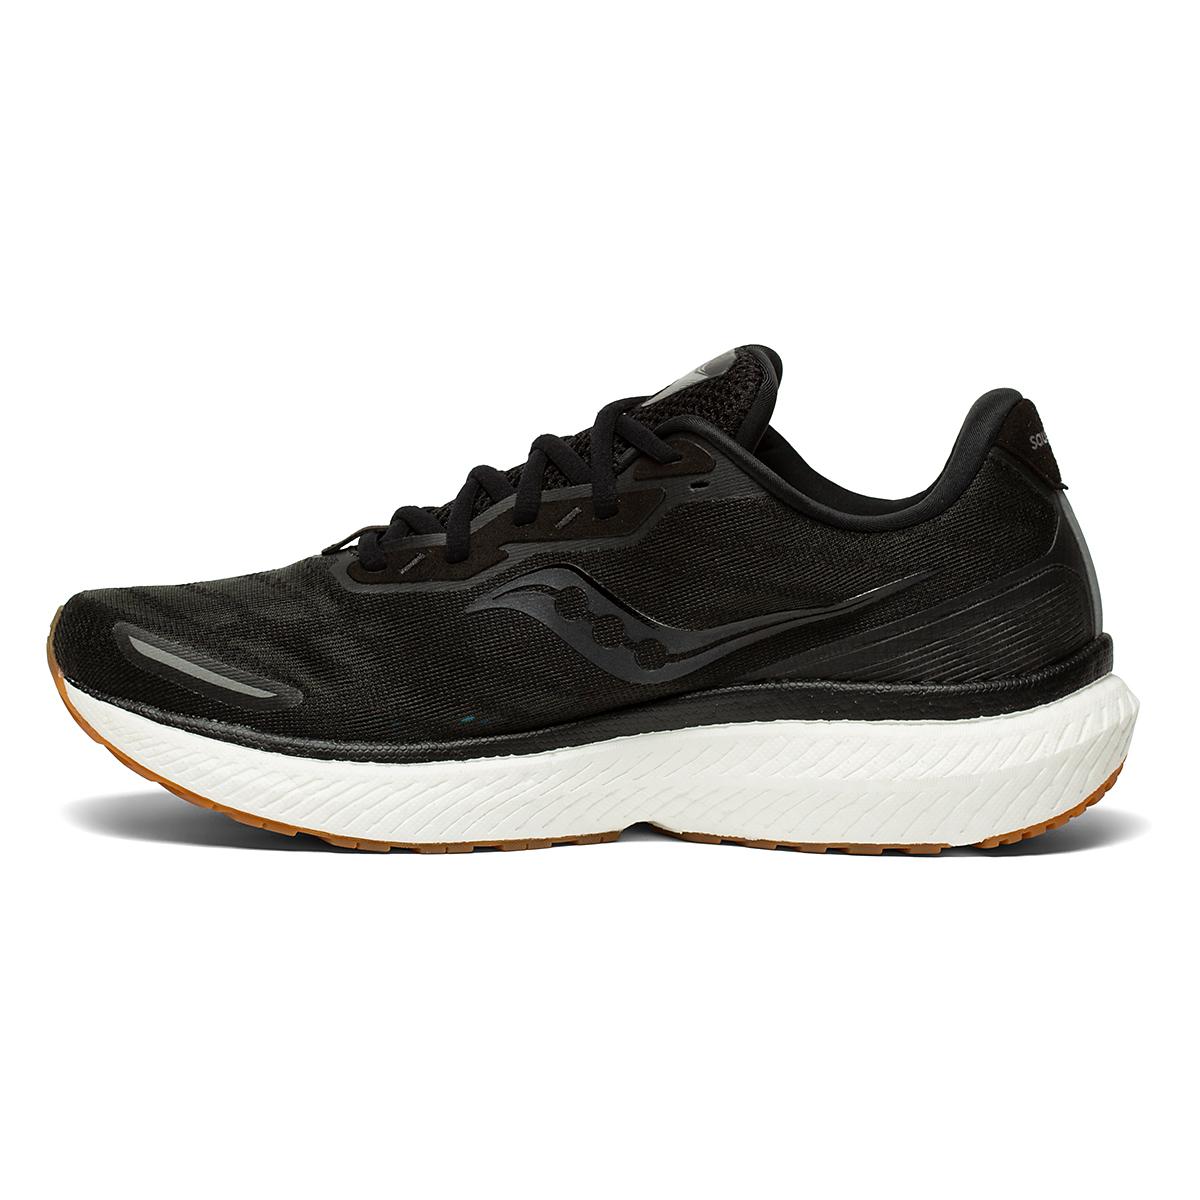 Men's Saucony Triumph 19 Running Shoe - Color: Black/Gum - Size: 7 - Width: Regular, Black/Gum, large, image 3